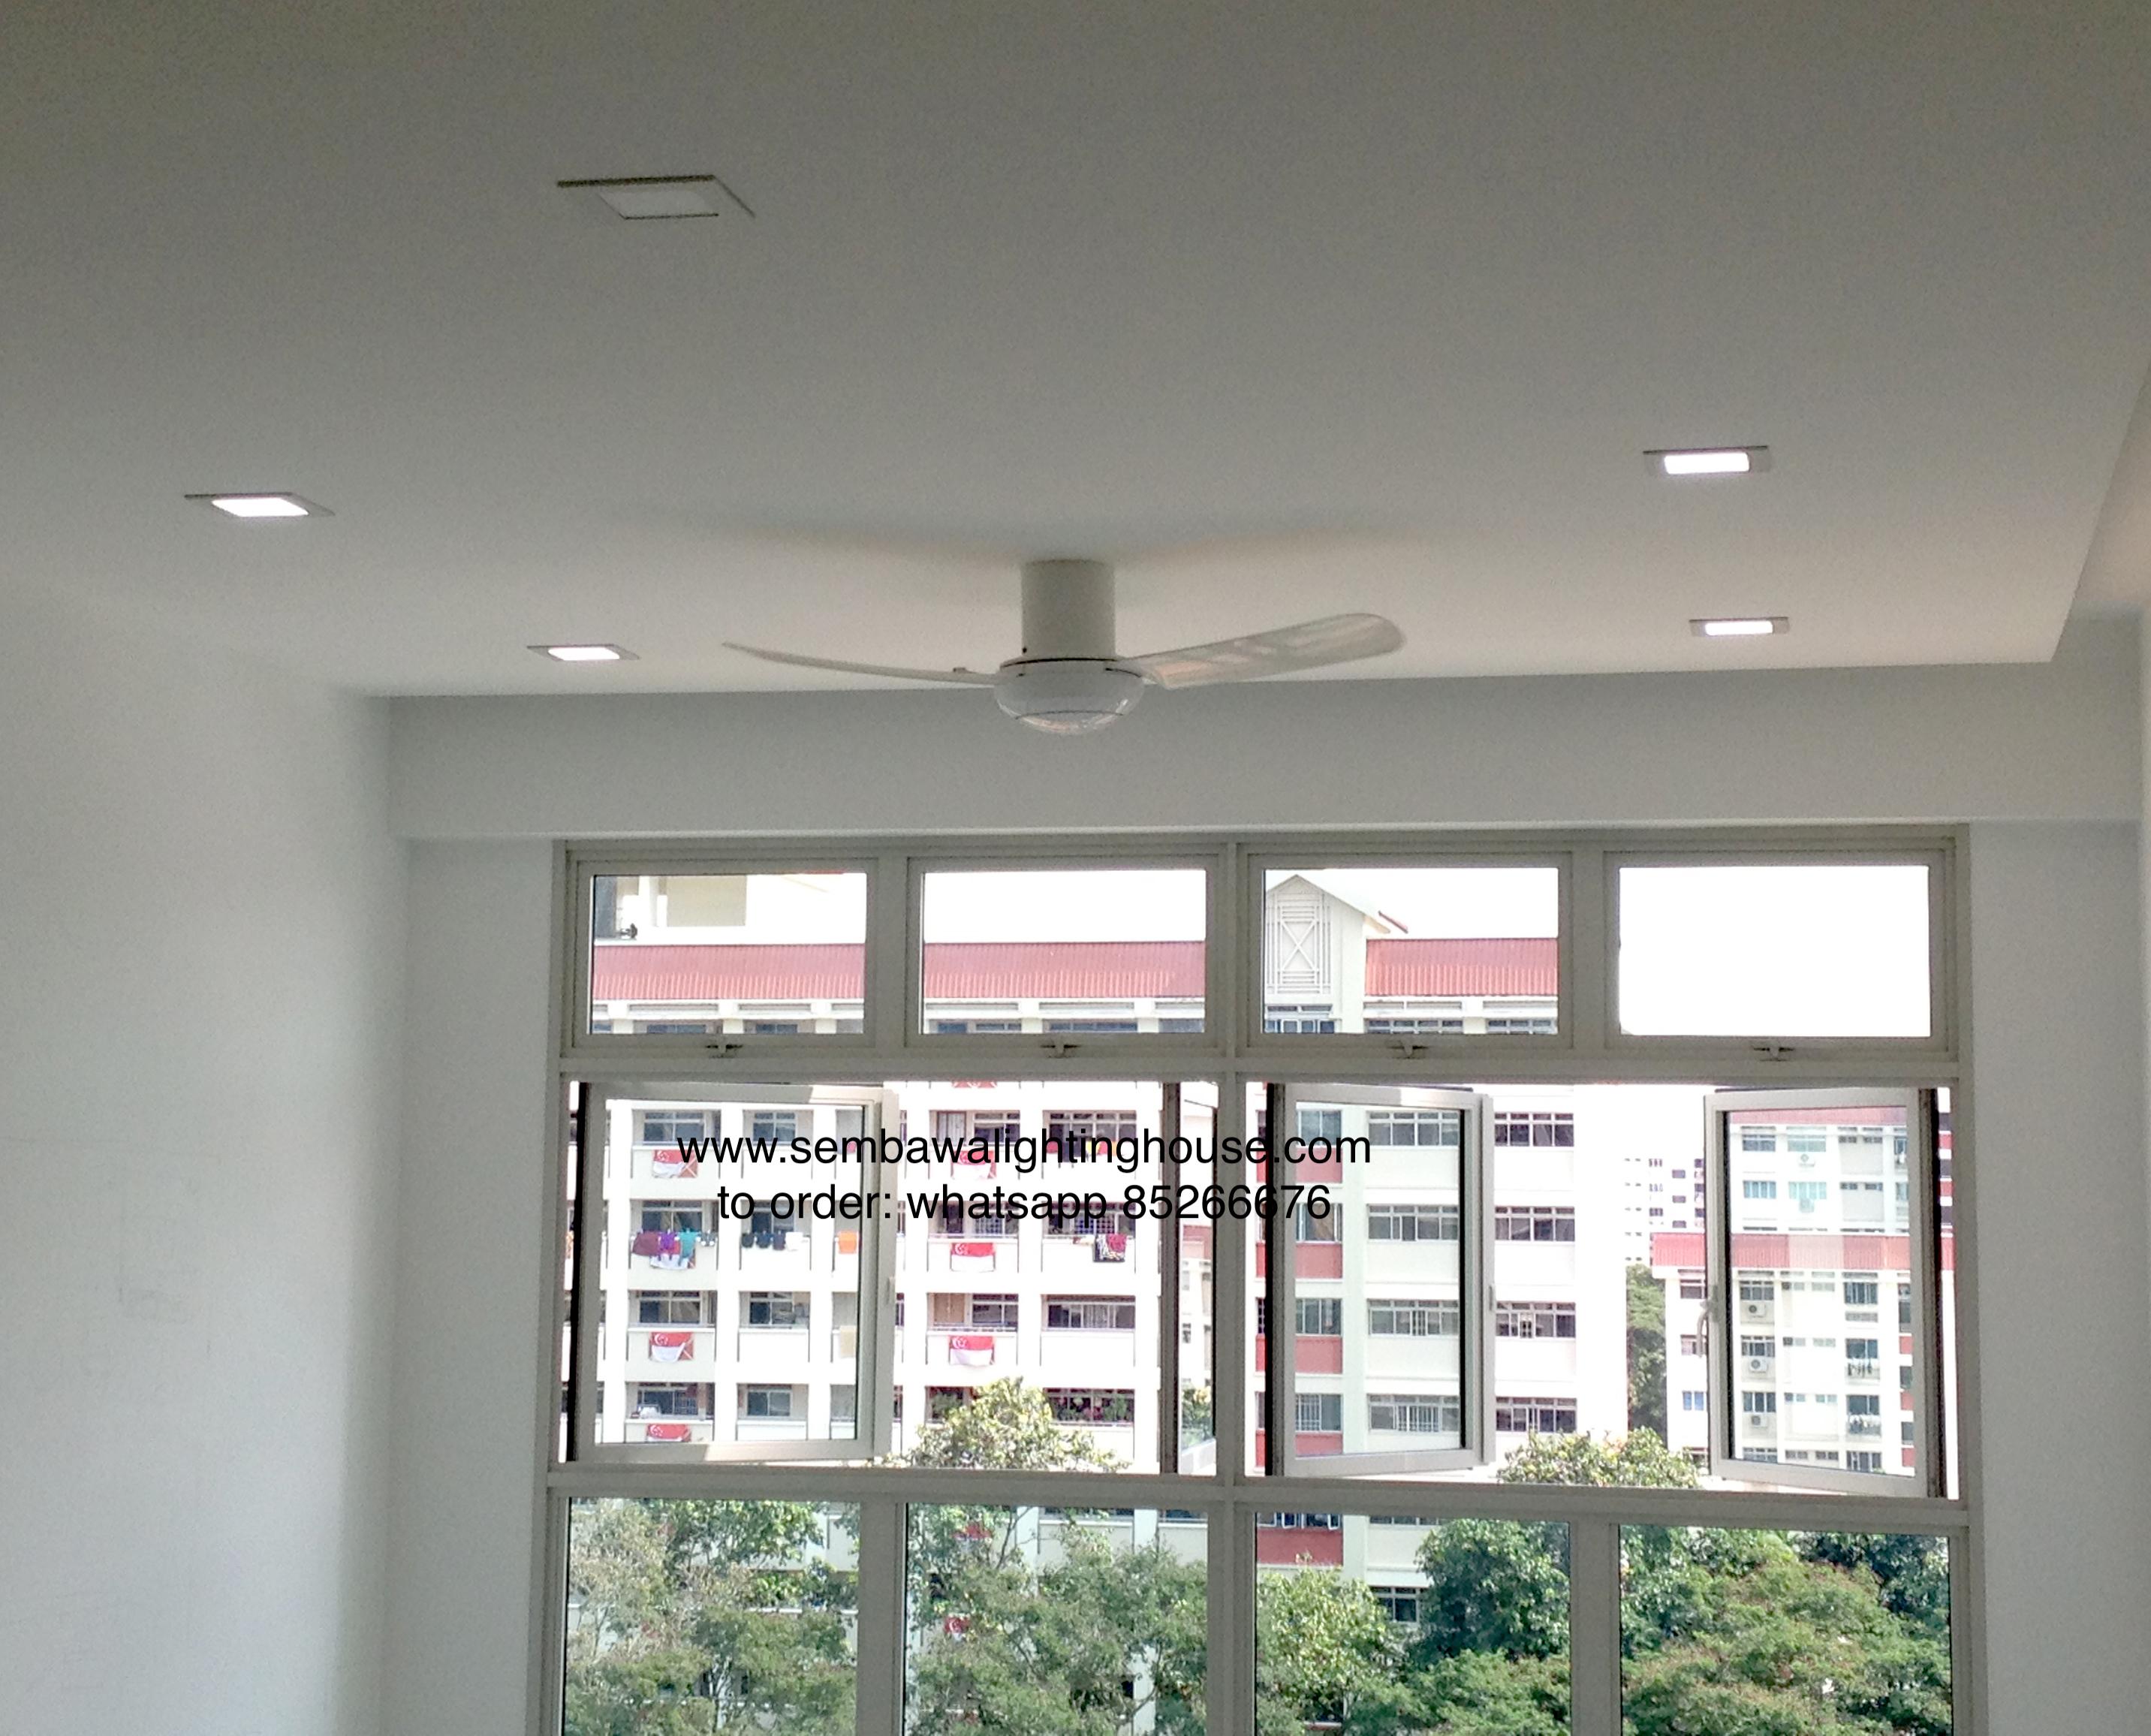 kdk-m11su-white-ceiling-fan-sembawang-lighting-house-sample-11.jpg